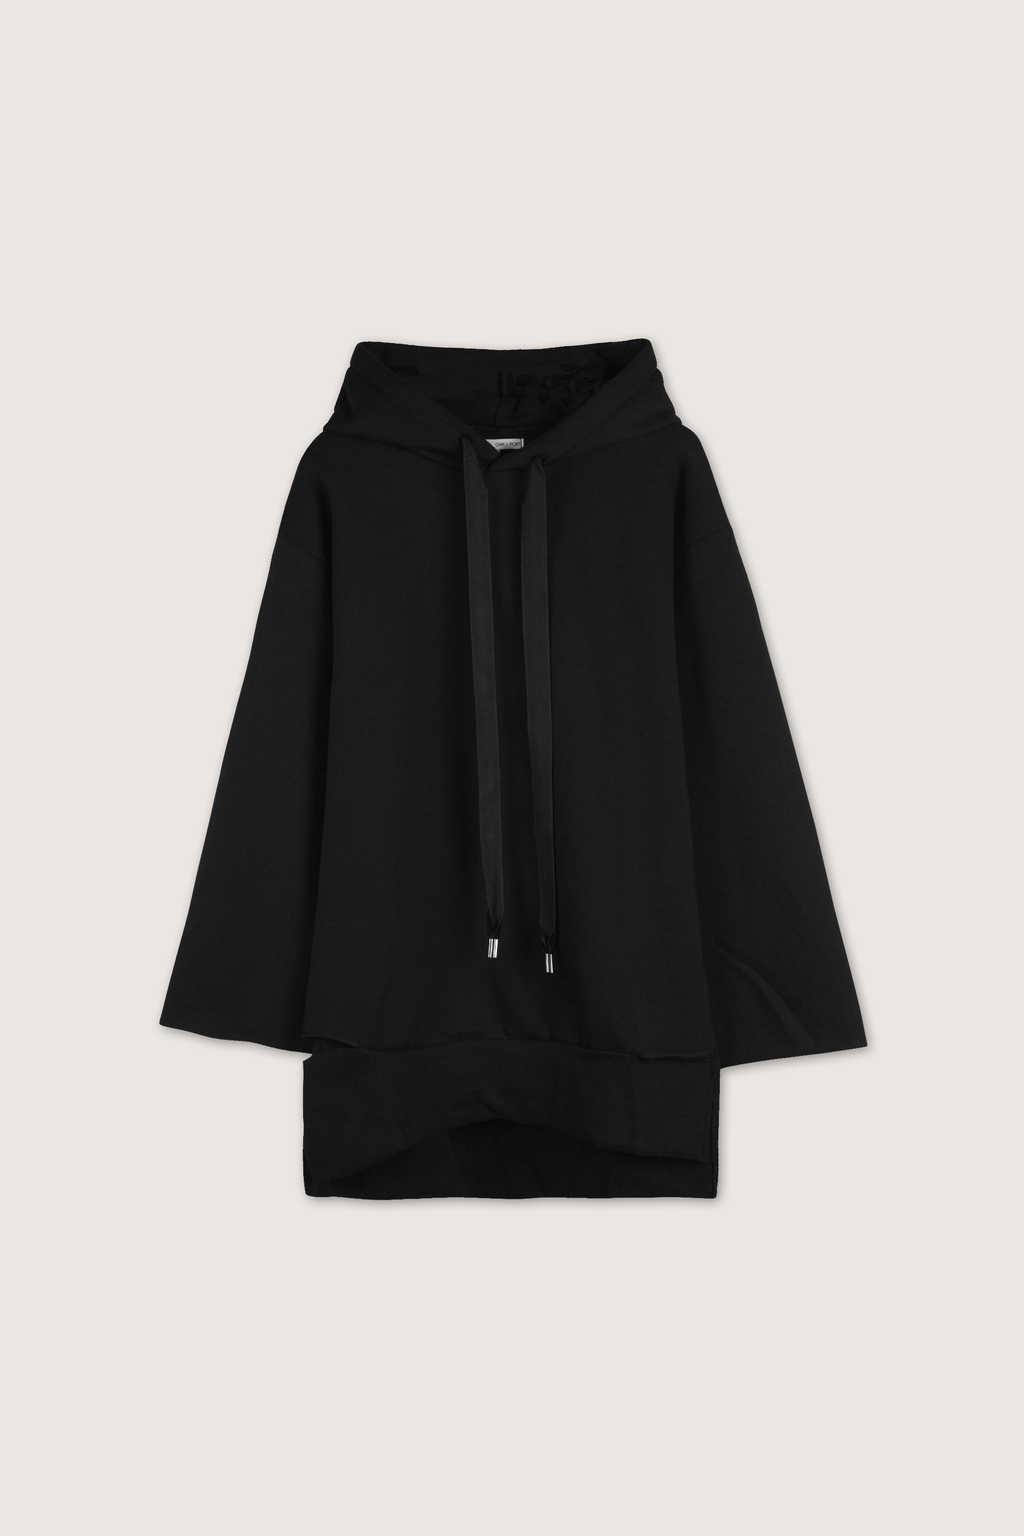 Hooded Tunic G013 Black 10